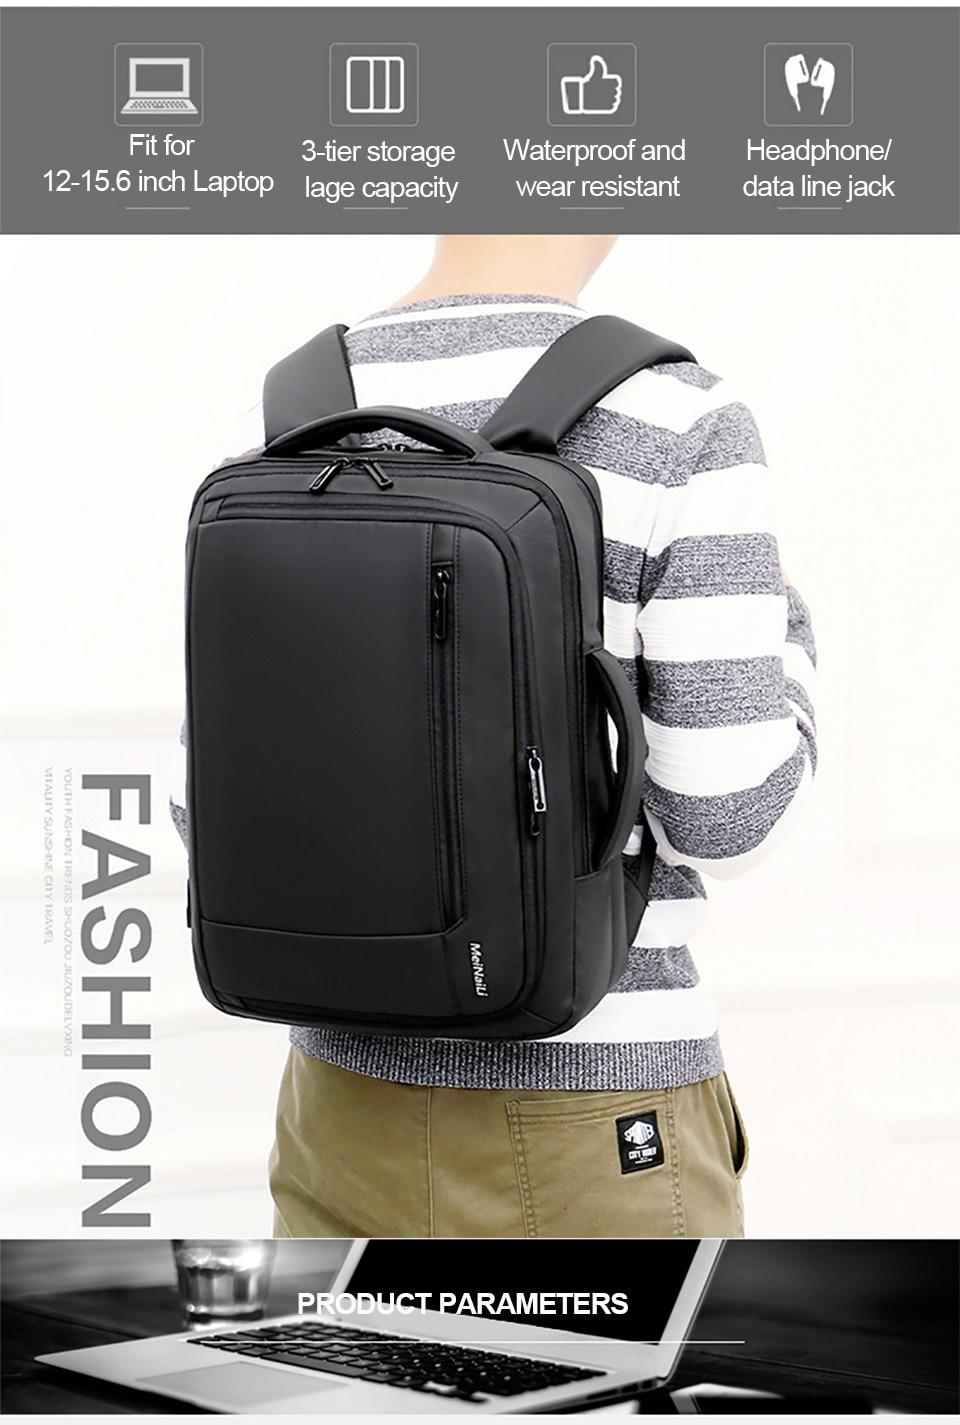 2 Multifunction USB Backpack Man Bag 15.6inch Laptop Backpacks Travel Bags Large Capacity Luggage Backpacking Waterproof Notebook